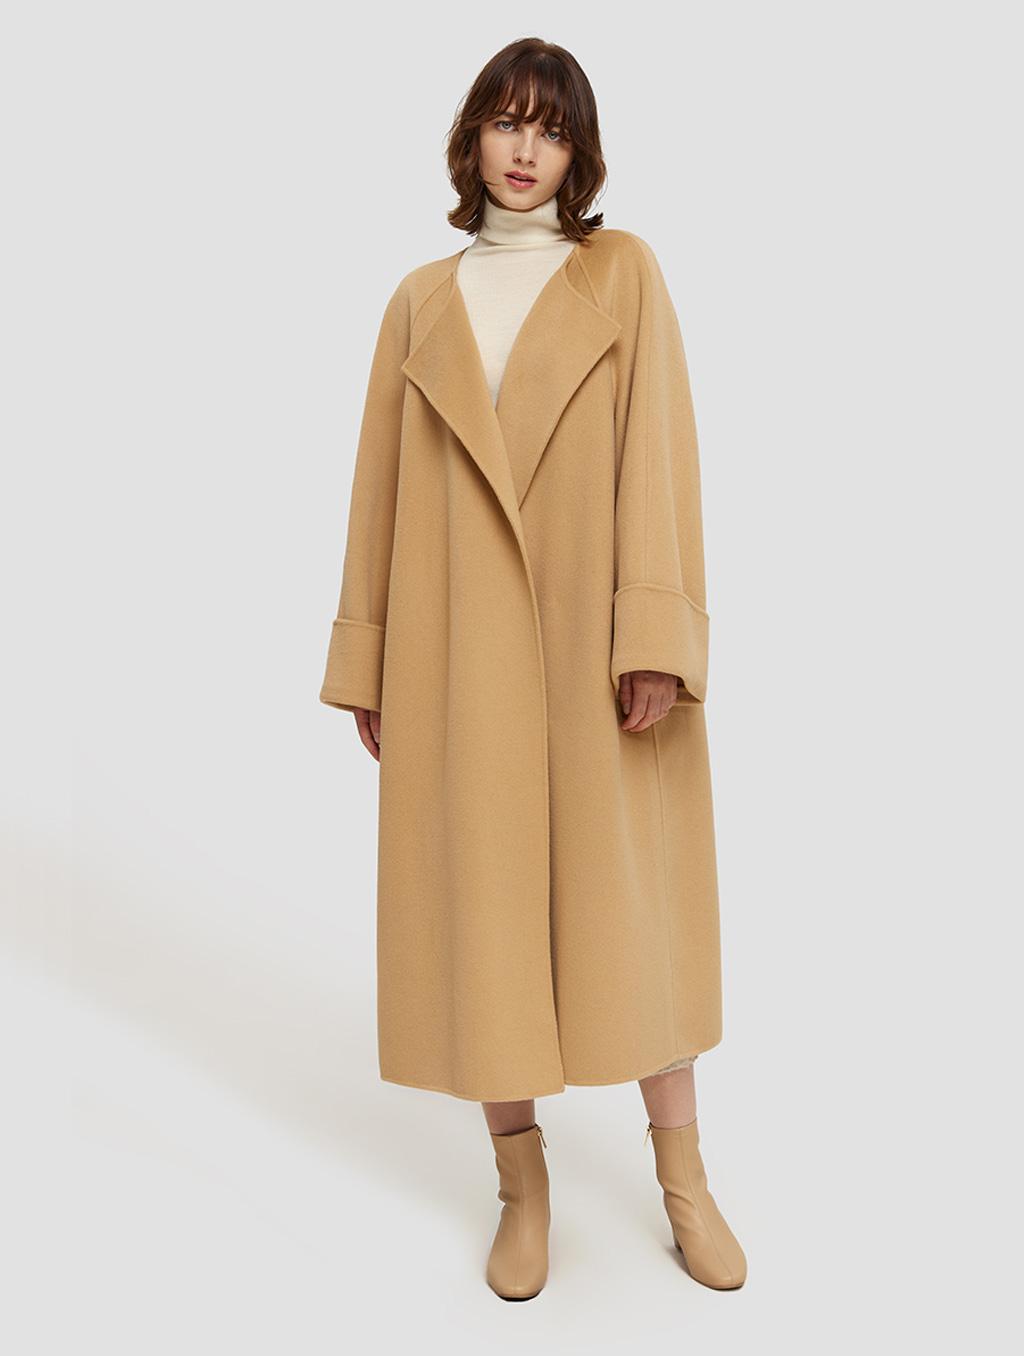 Long Straight Cut Wool Coat- positive1-camel